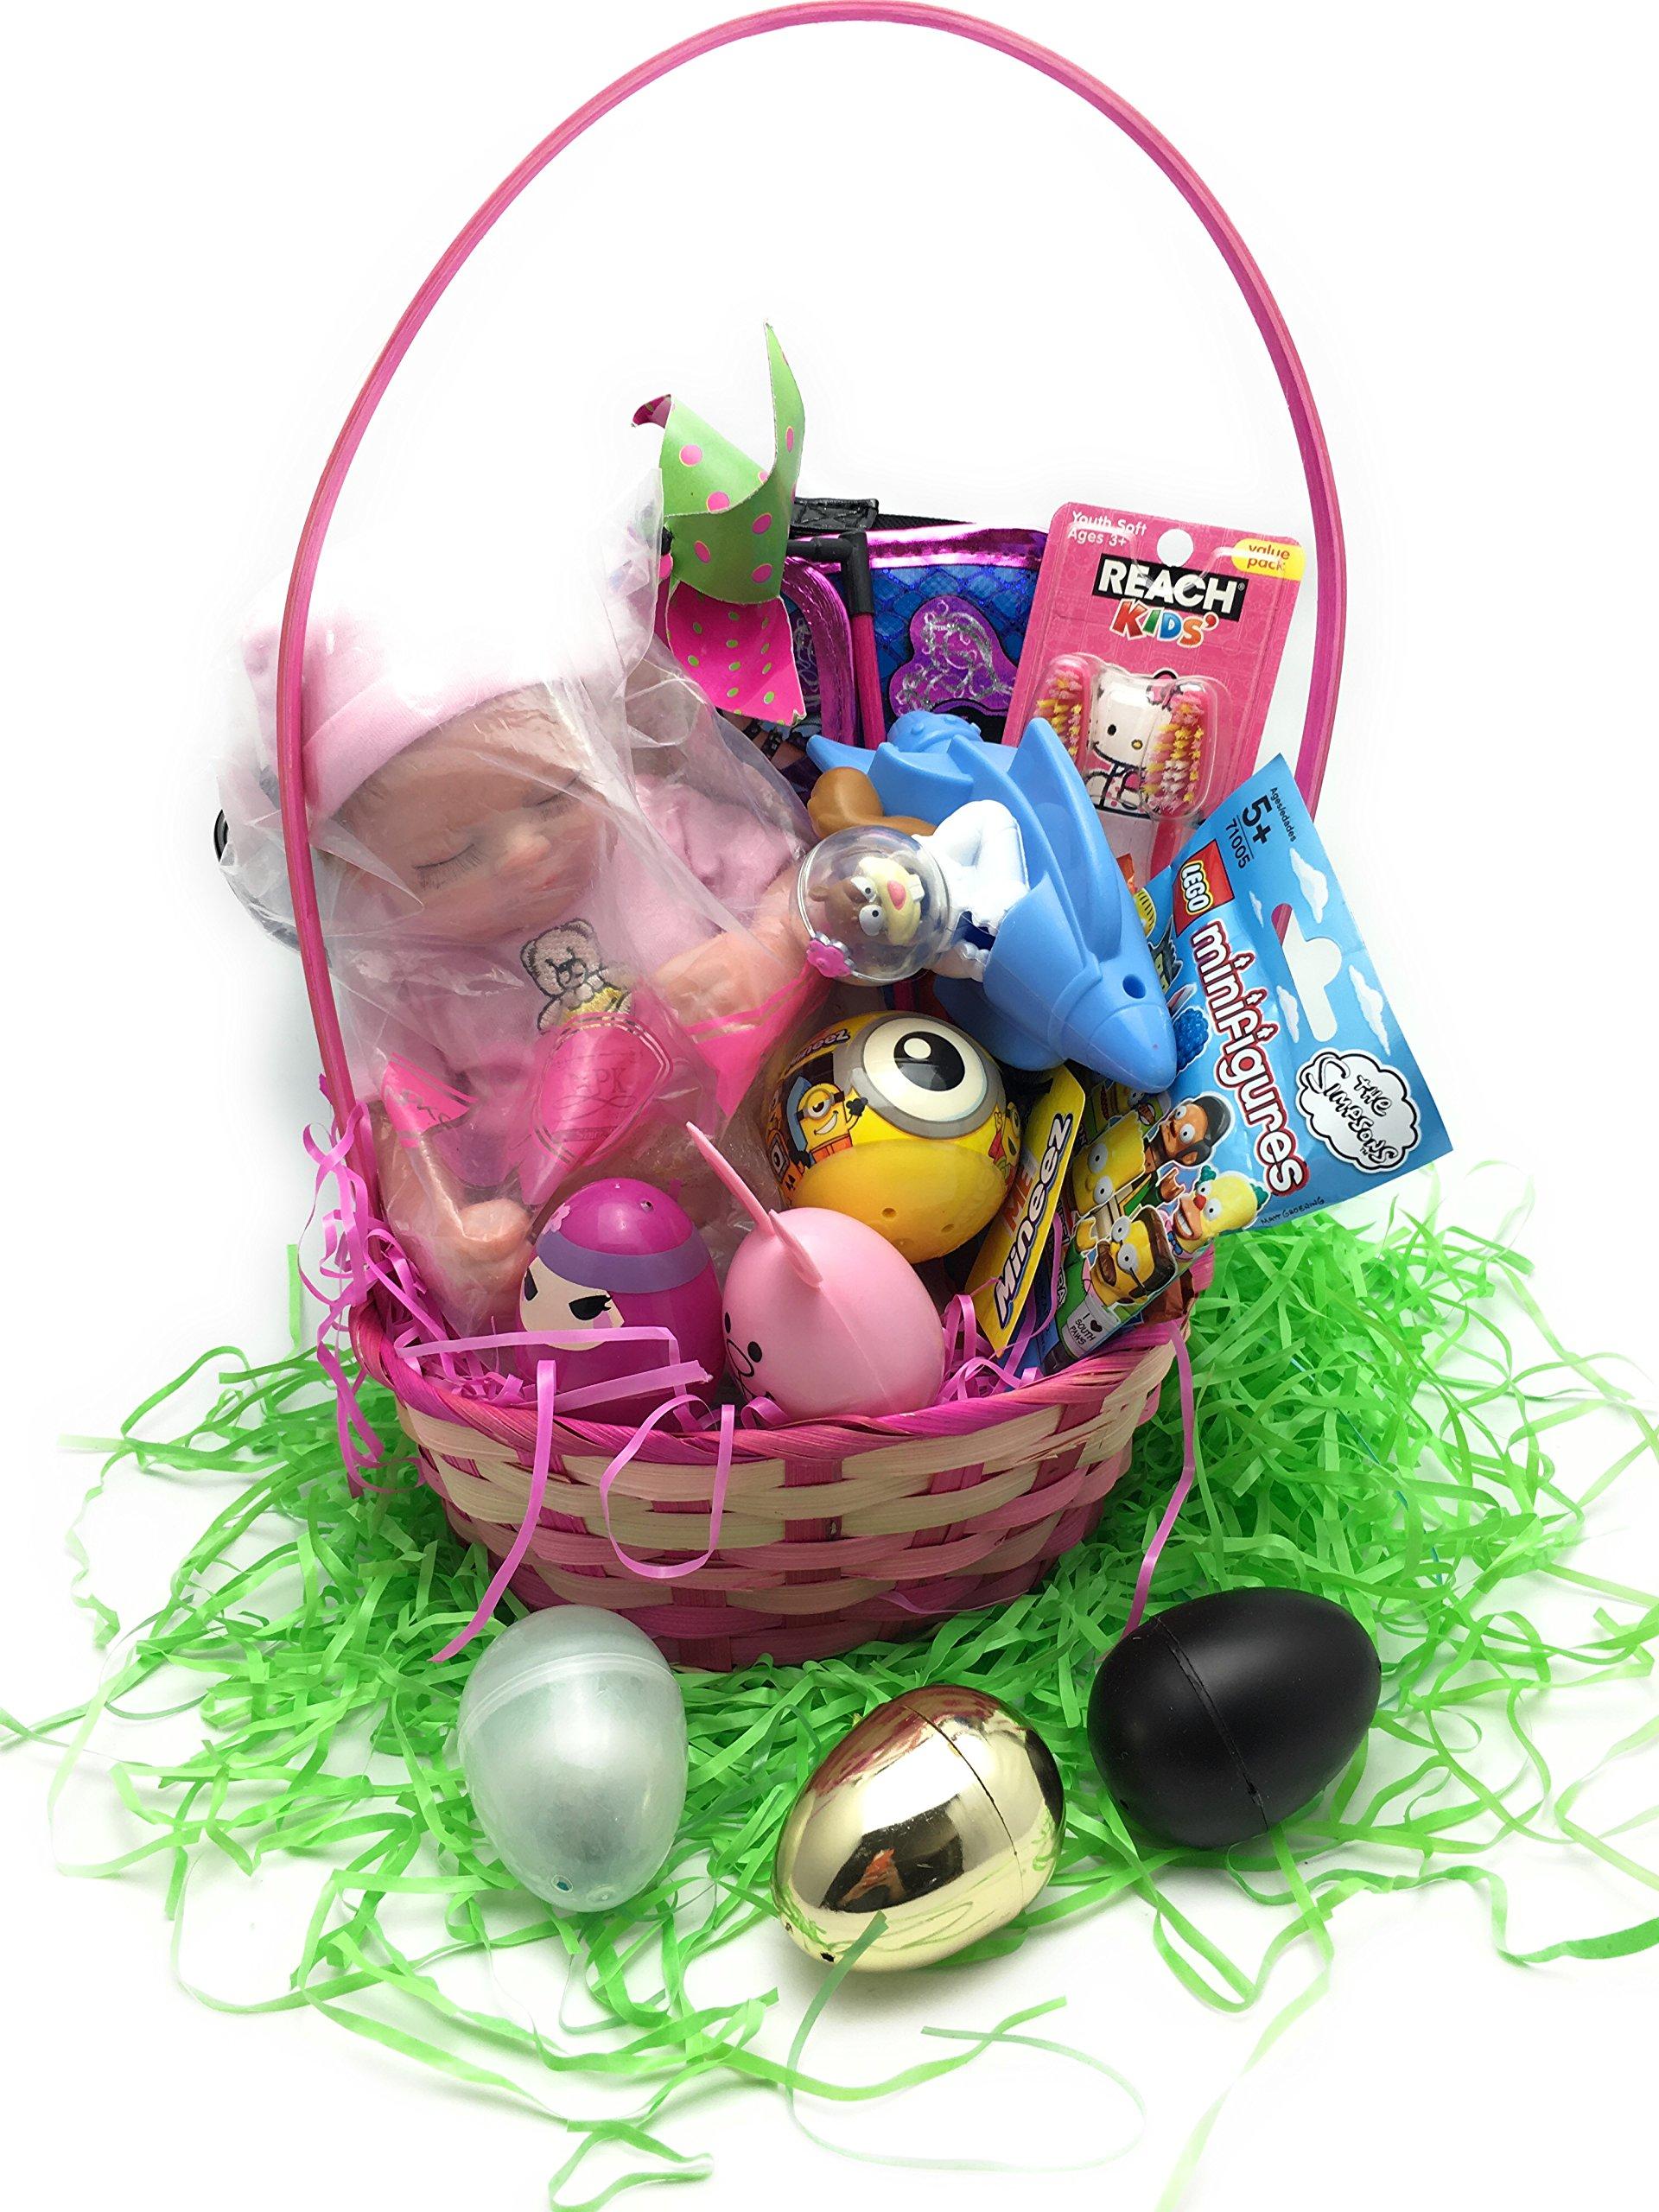 Kidstuff's Exclusive Ultimate Filled Surprise Easter Egg YouTube Surprise Egg or Basket Unboxing Blind Bag Kids Toys Surprises Birthday Gift (Super Ultimate NPK Collection Doll Girl Gift Basket)